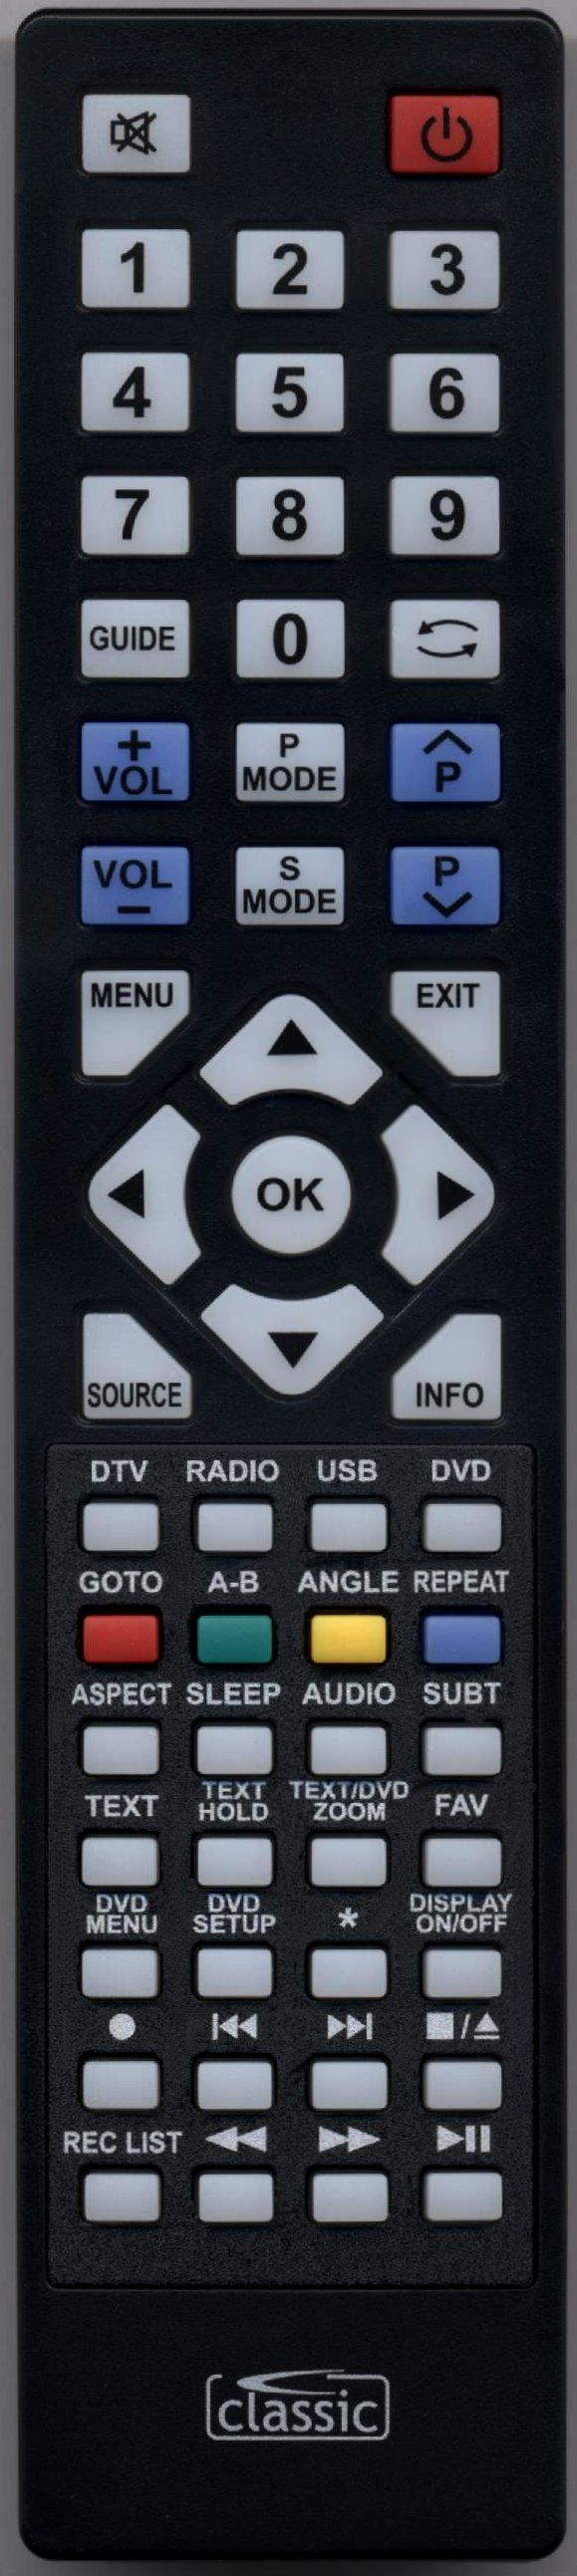 BLAUPUNKT 236/173J-GB-4B-HCDU-UK Remote Control Alternative